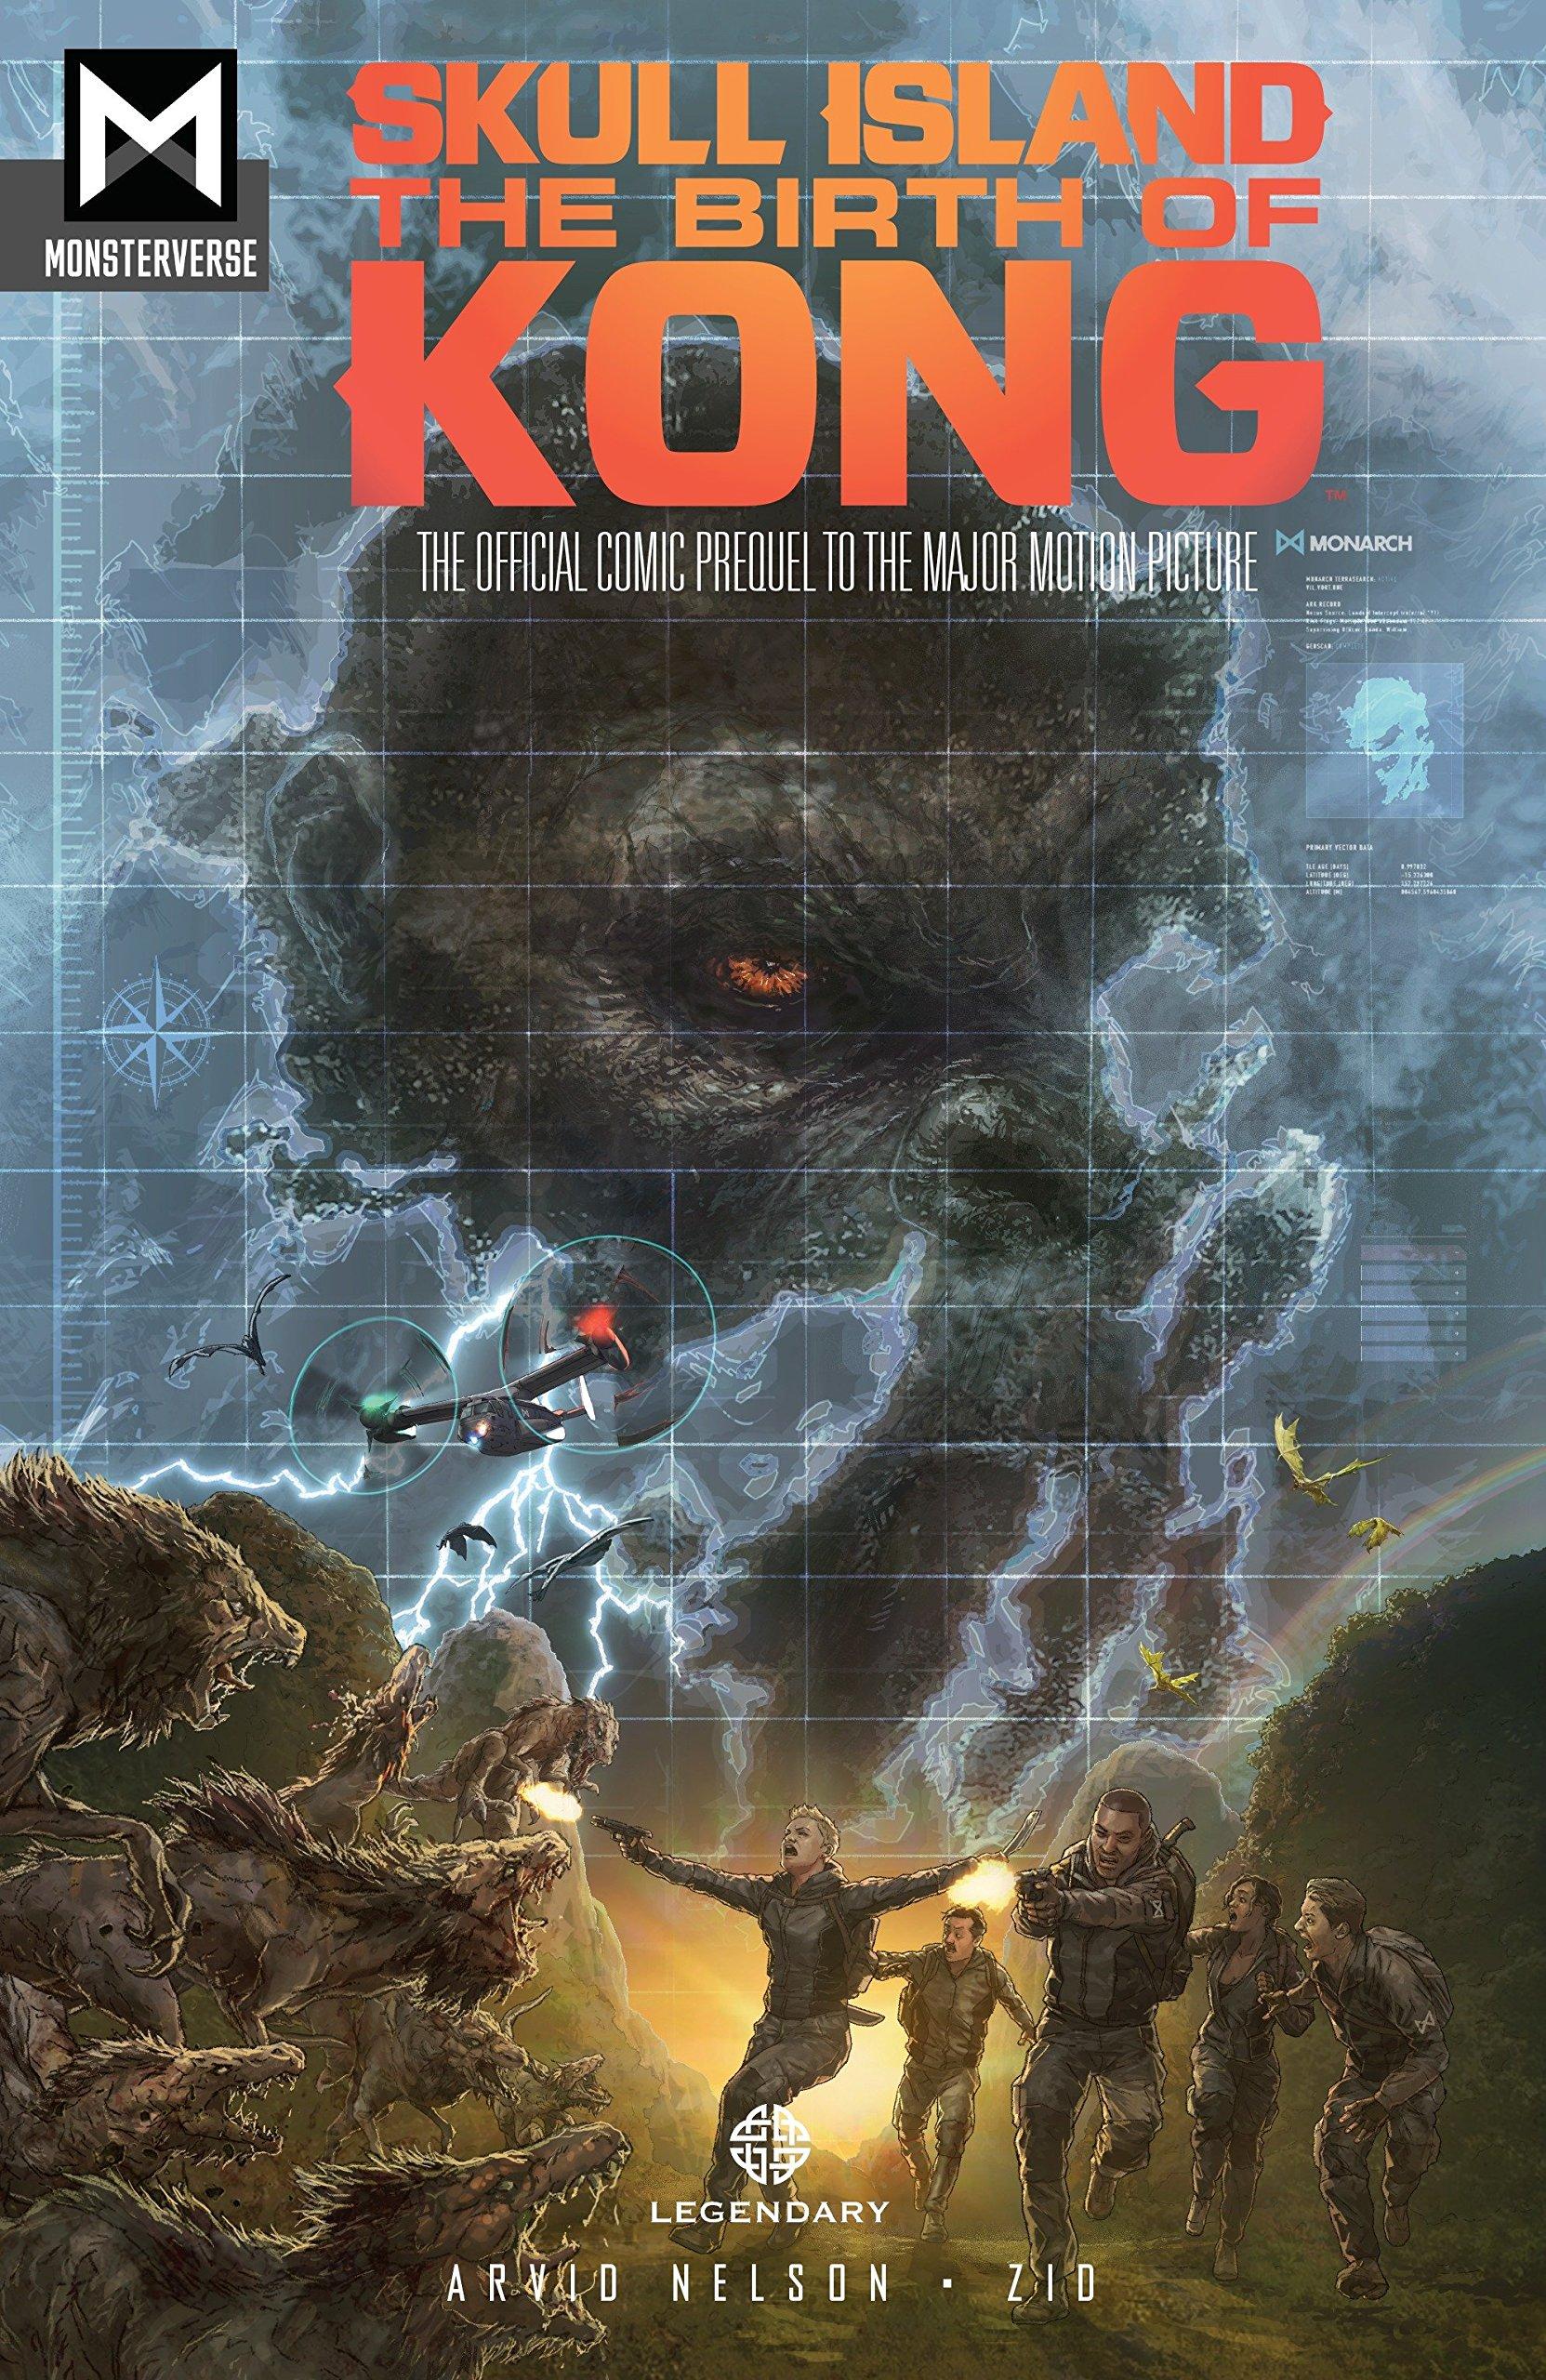 kong skull island full movie english subtitle 2017